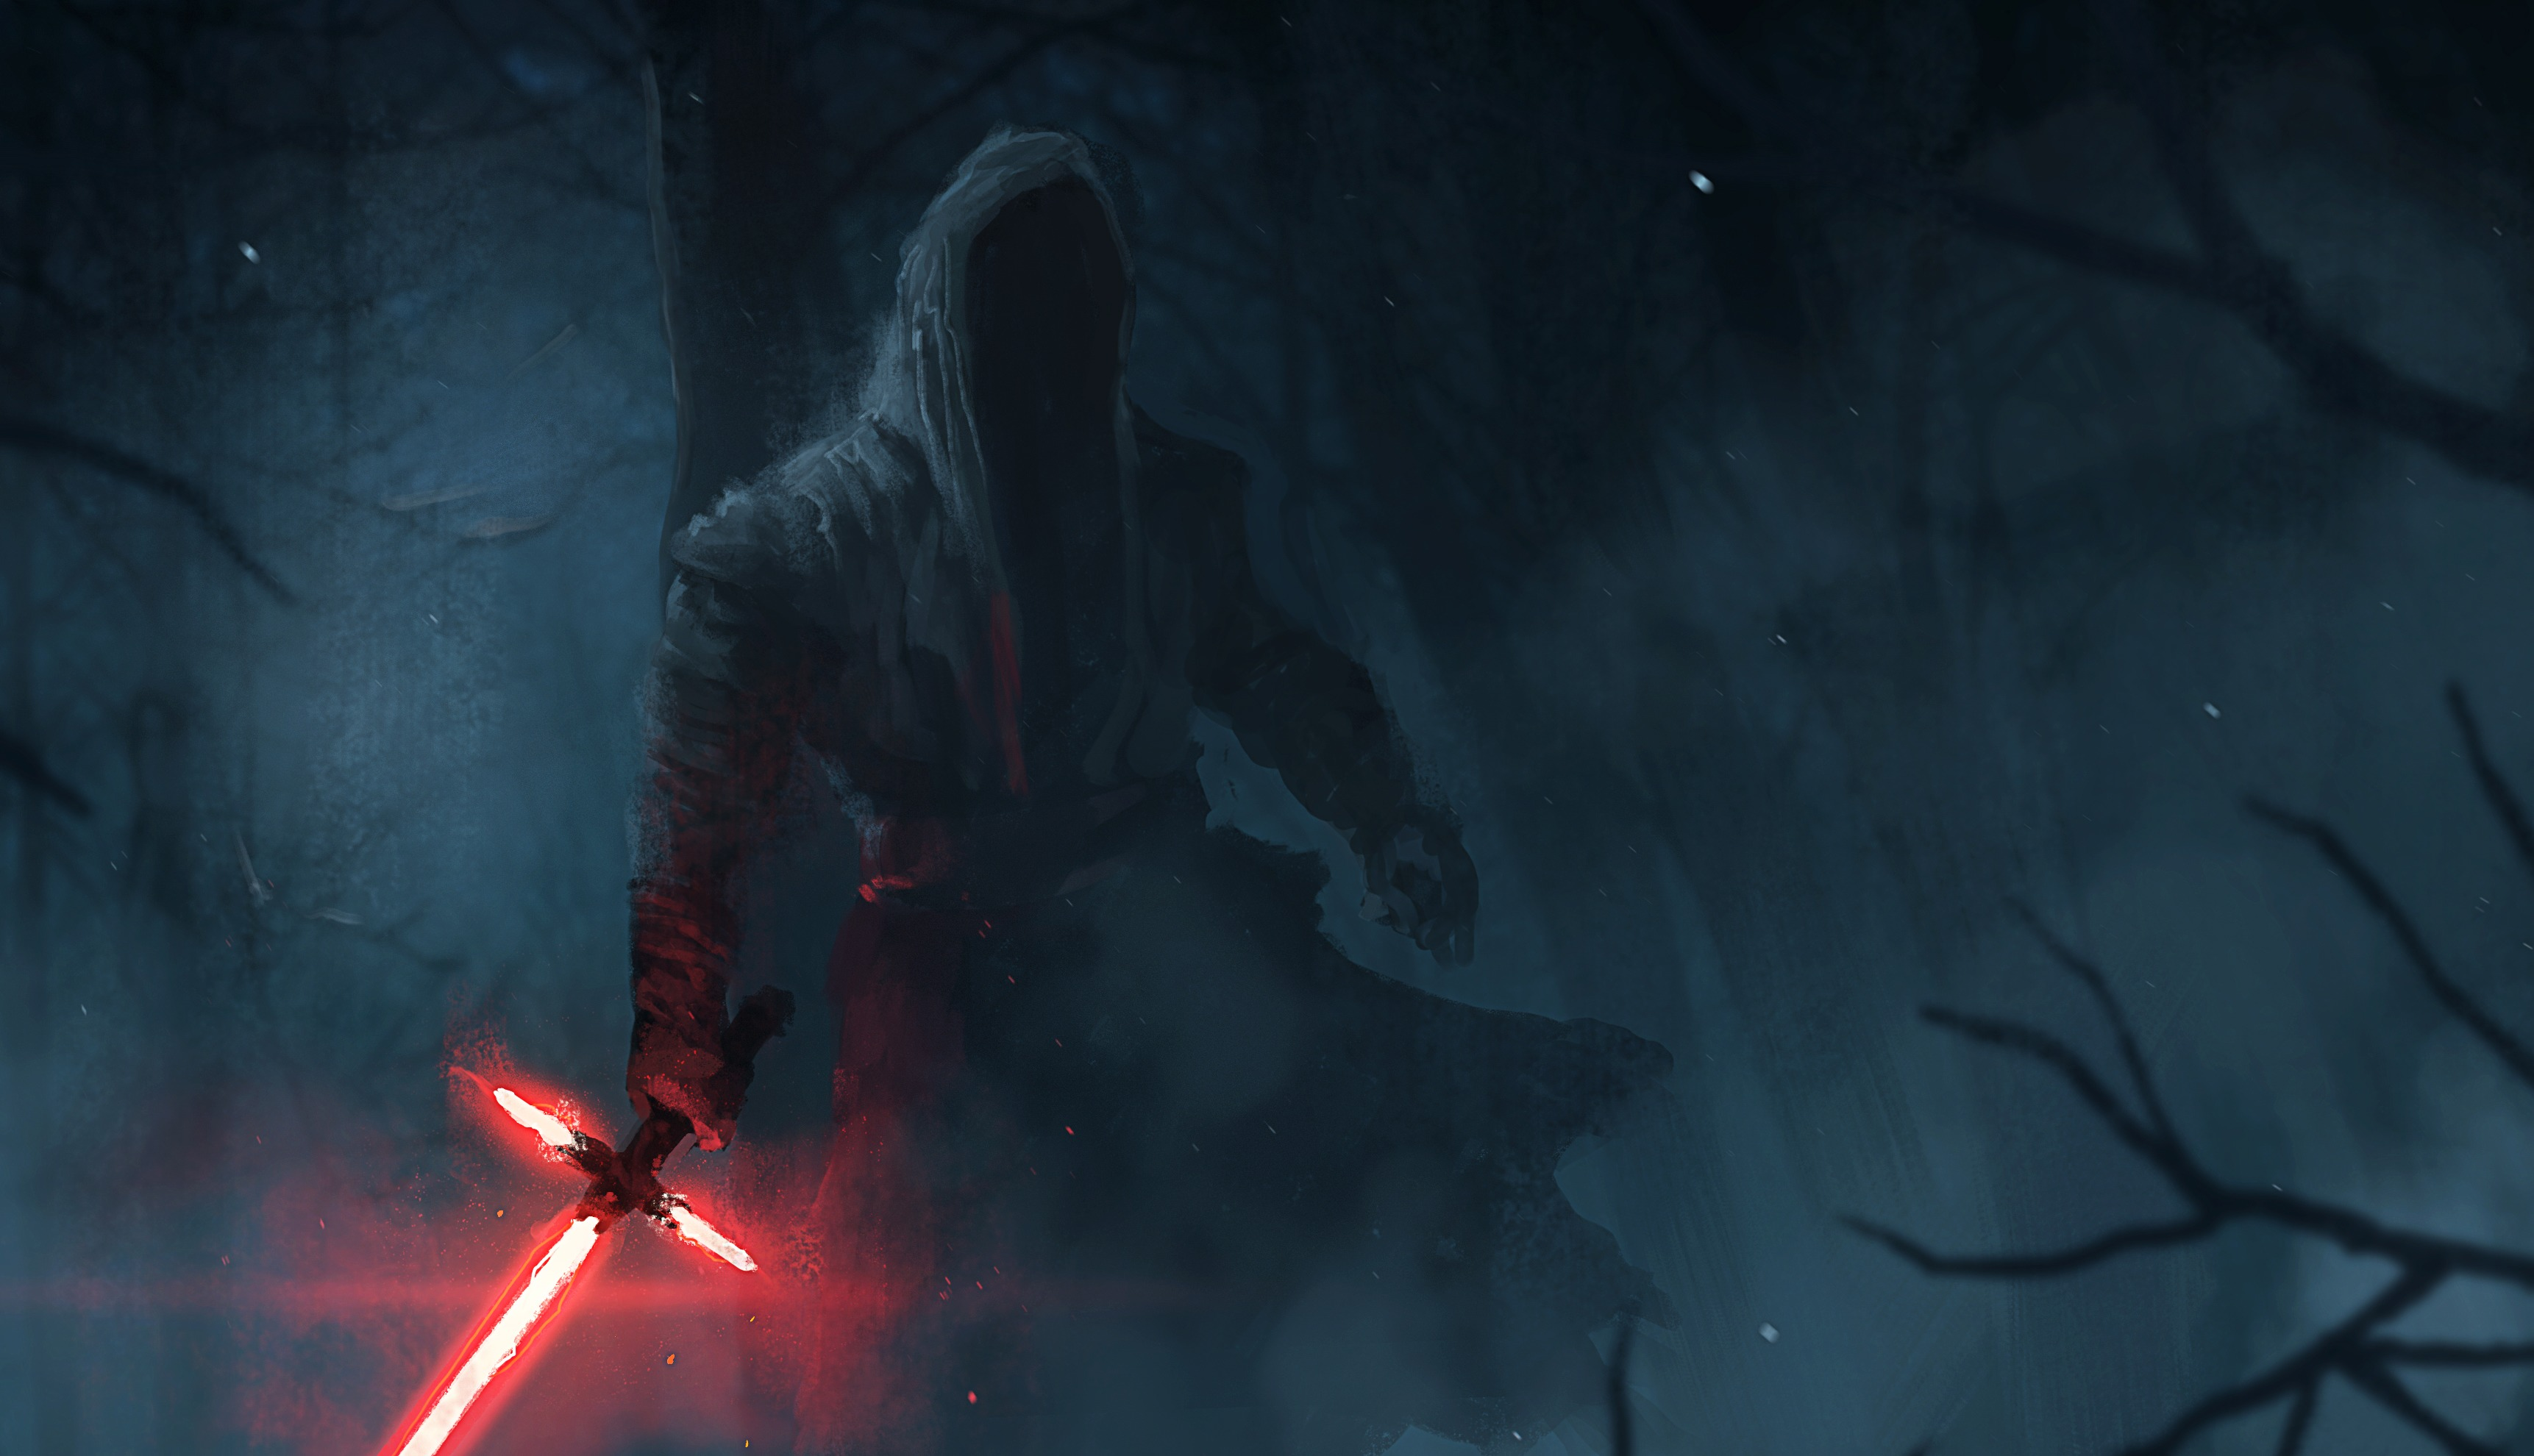 Star Wars The Force Awakens Kylo Ren Lightsaber Wallpaper